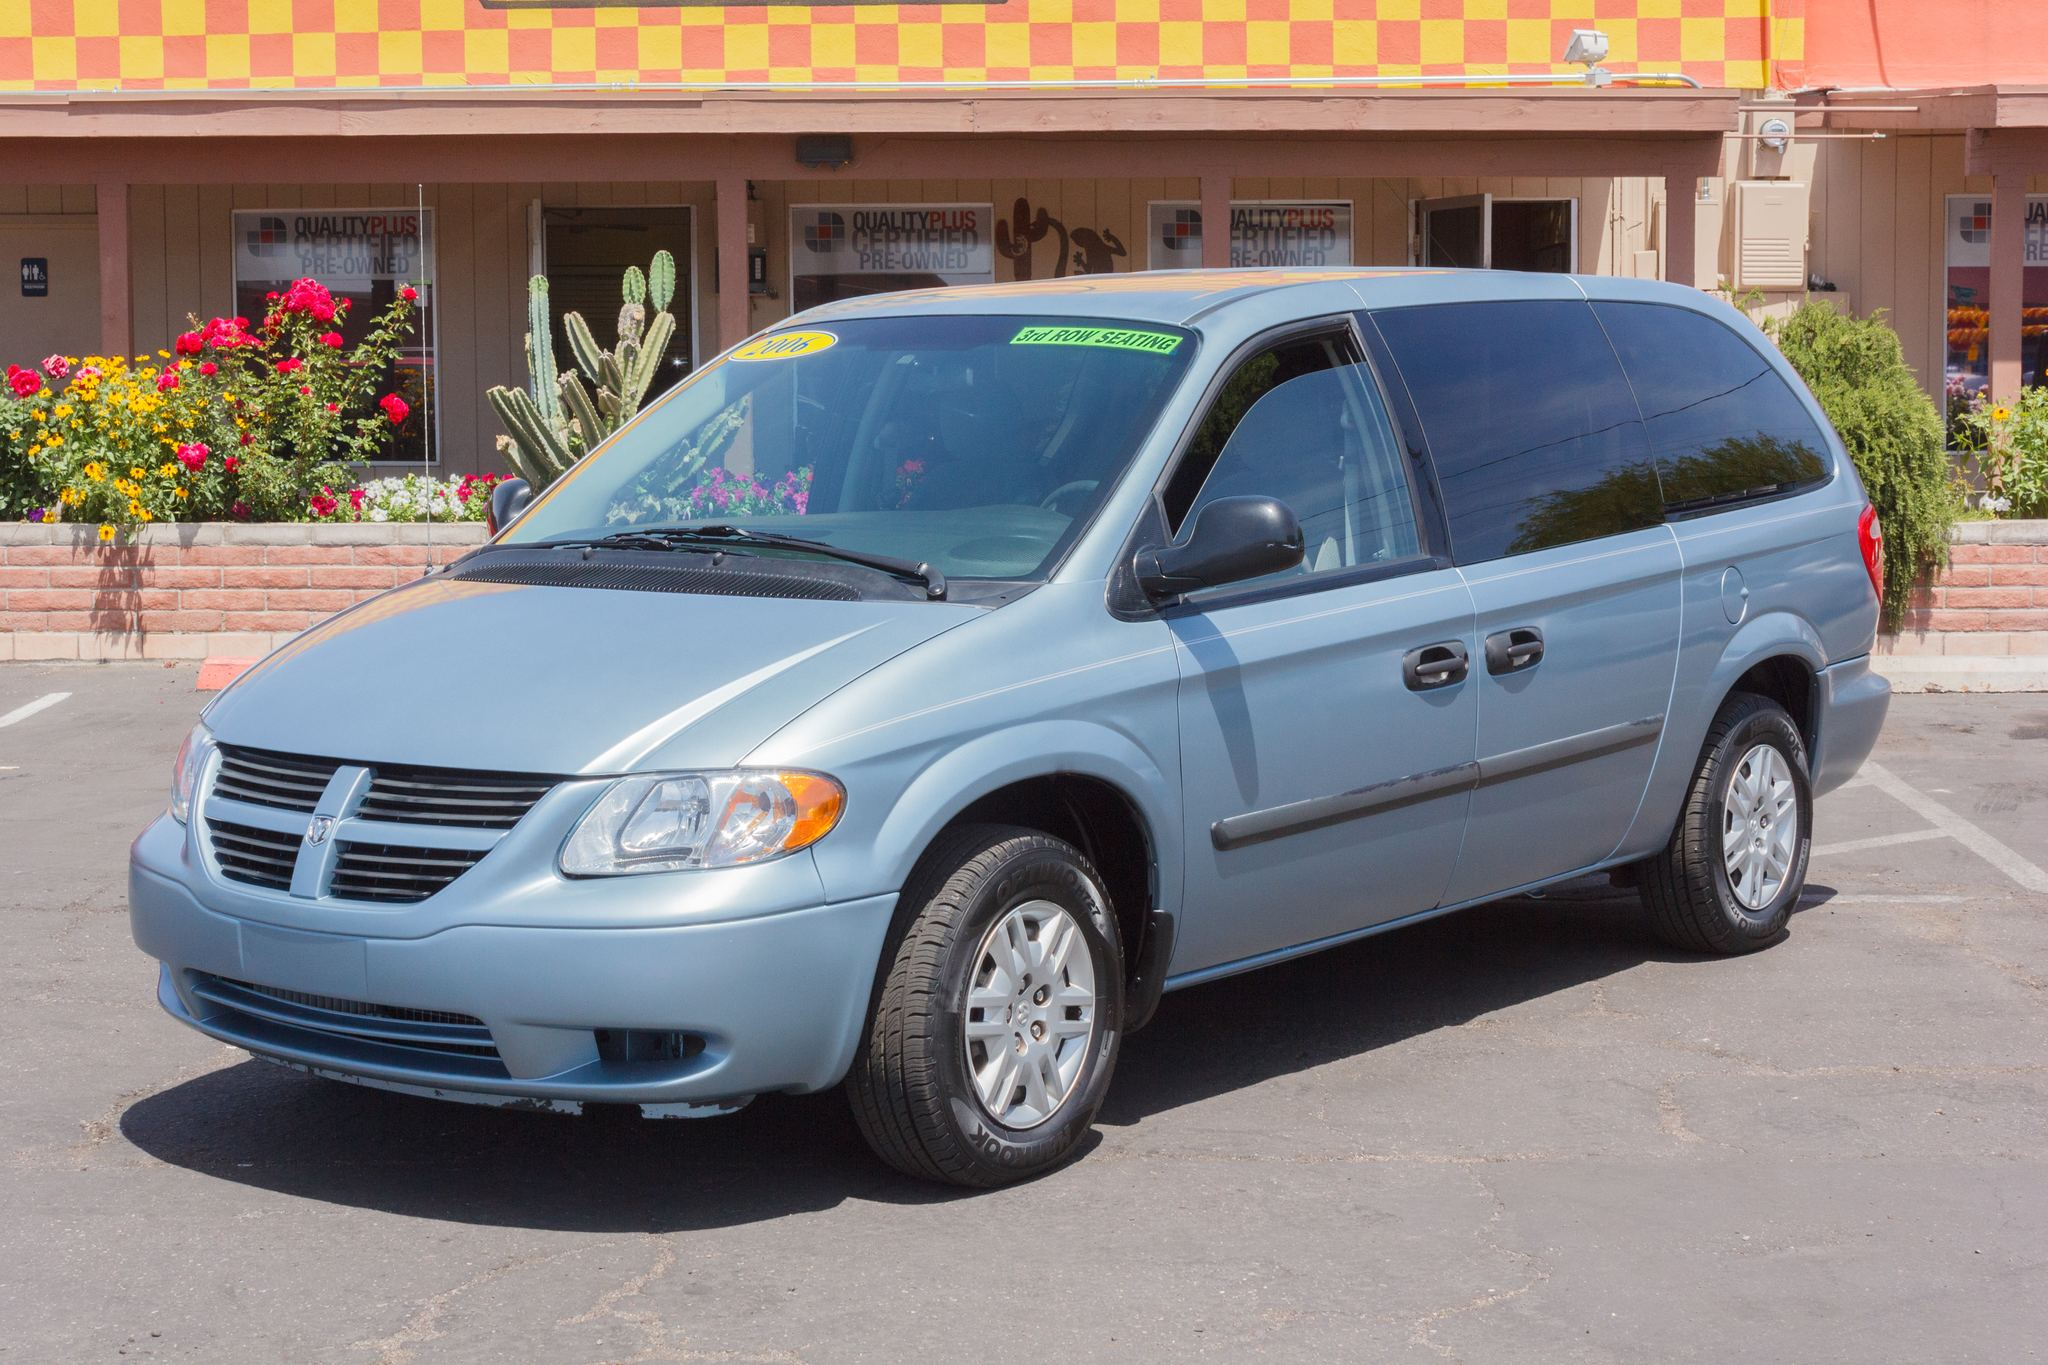 Photo of 2006 Dodge Grand Caravan 4d Wagon SE Atlantic Blue Pearlcoat